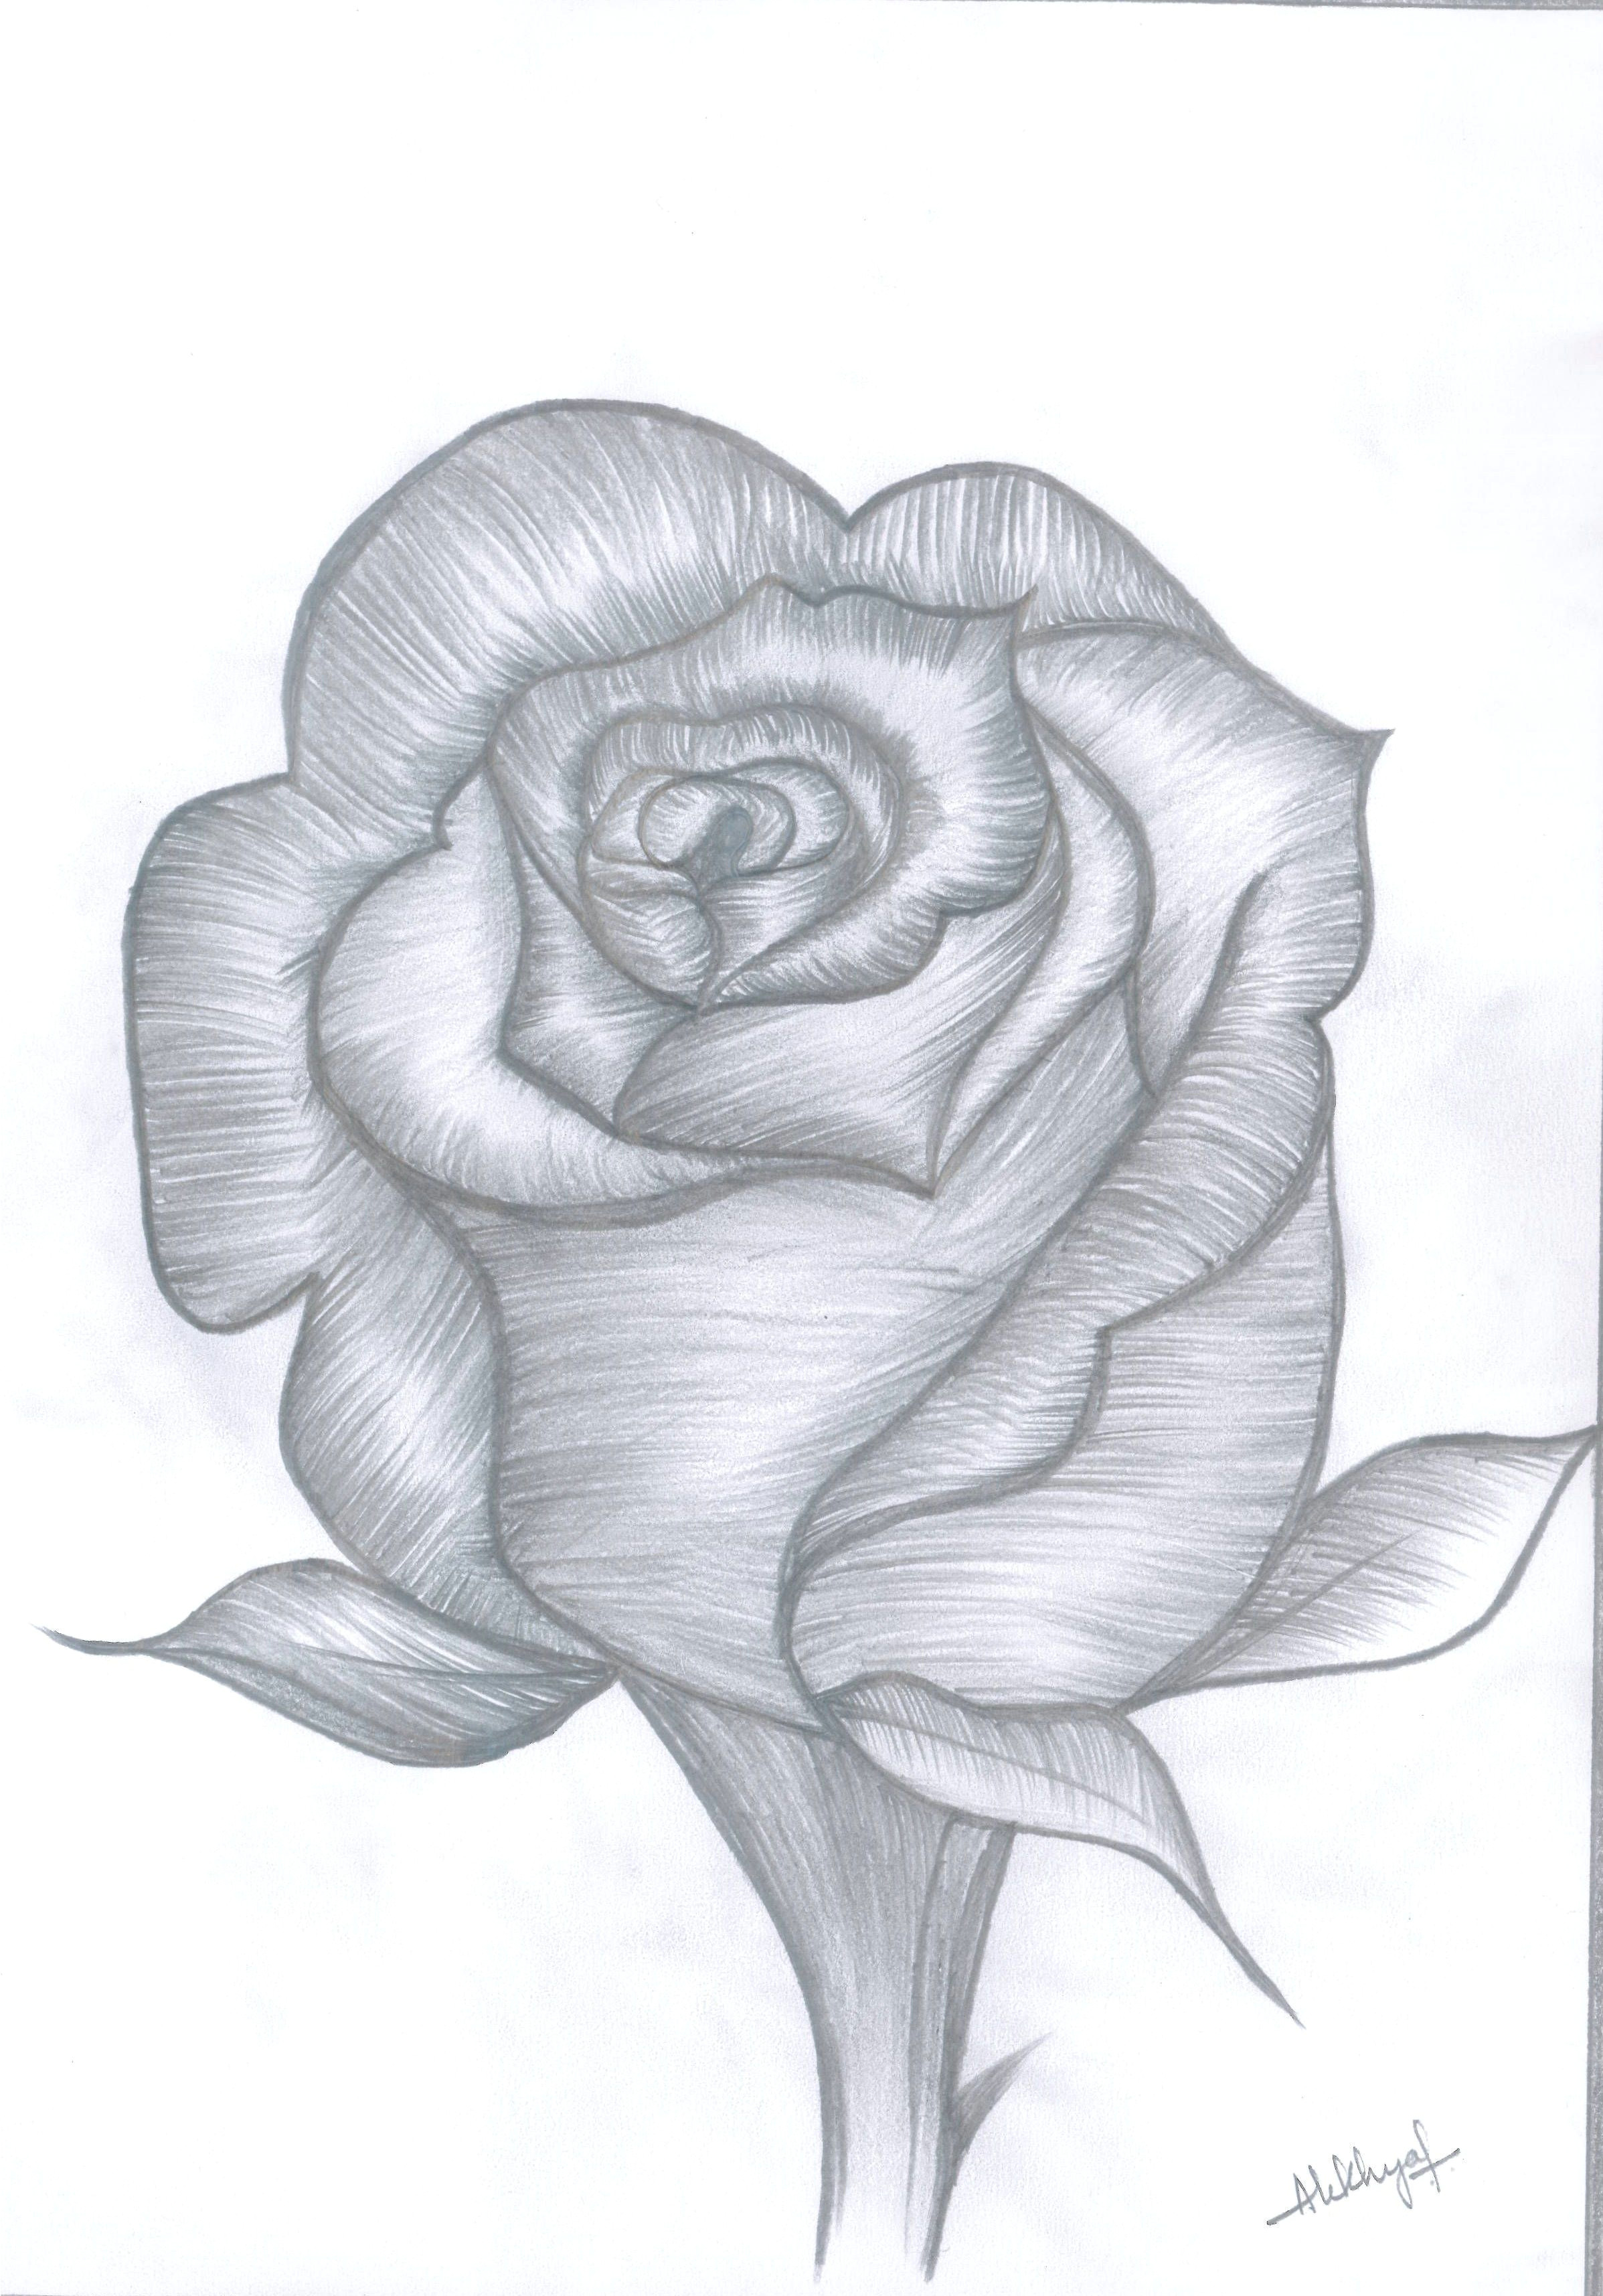 rose bud rose buds pencil drawings sandro graphite drawings color pencil drawings